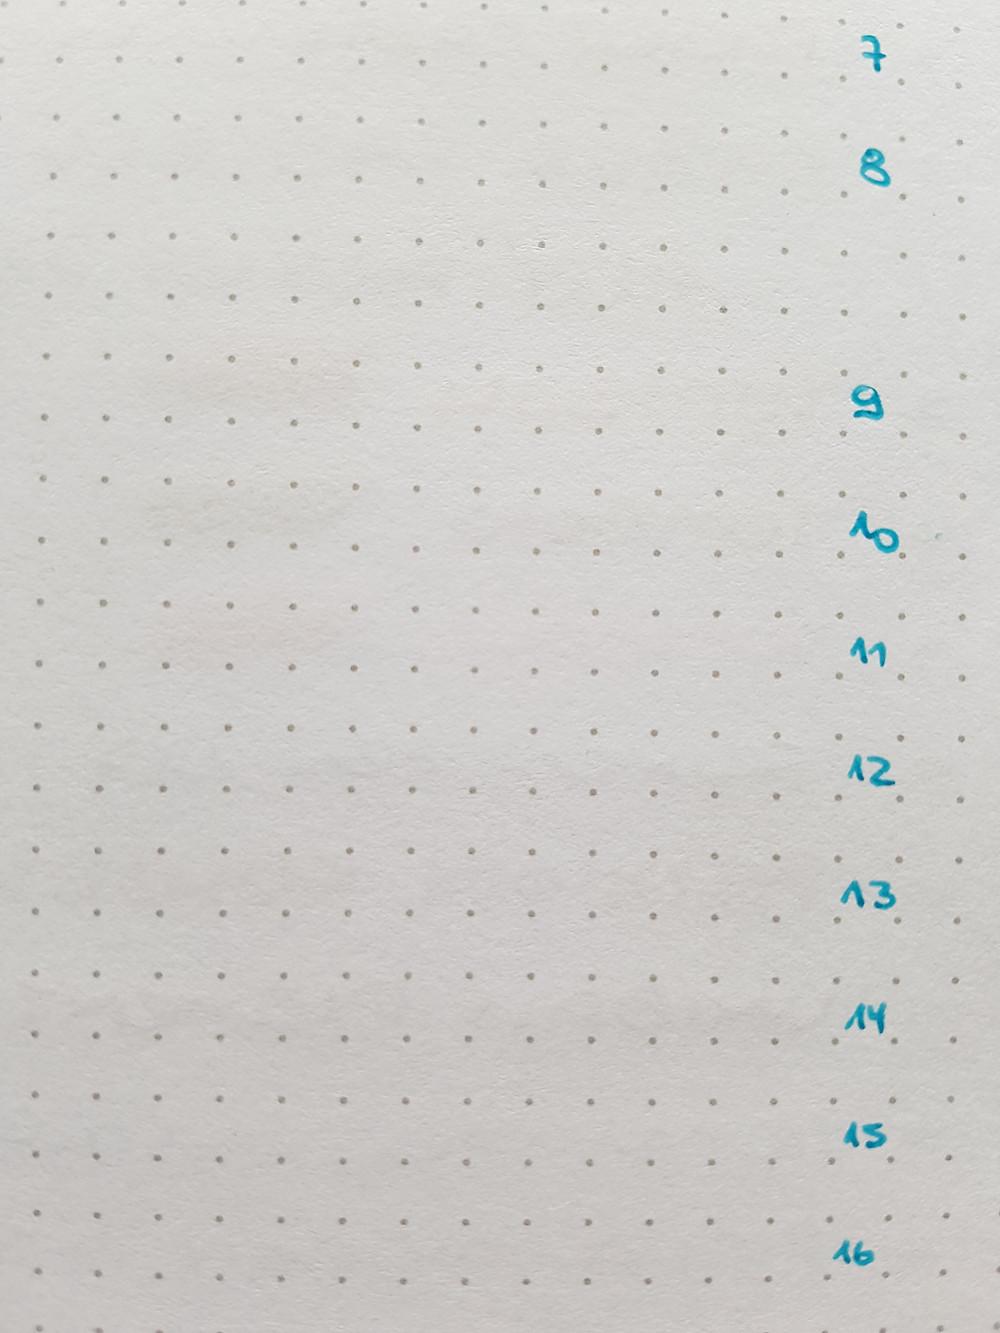 StickersSwissMade - blogpost - paper and pen test nbr 4 -  dotgrid.co notebooks_7